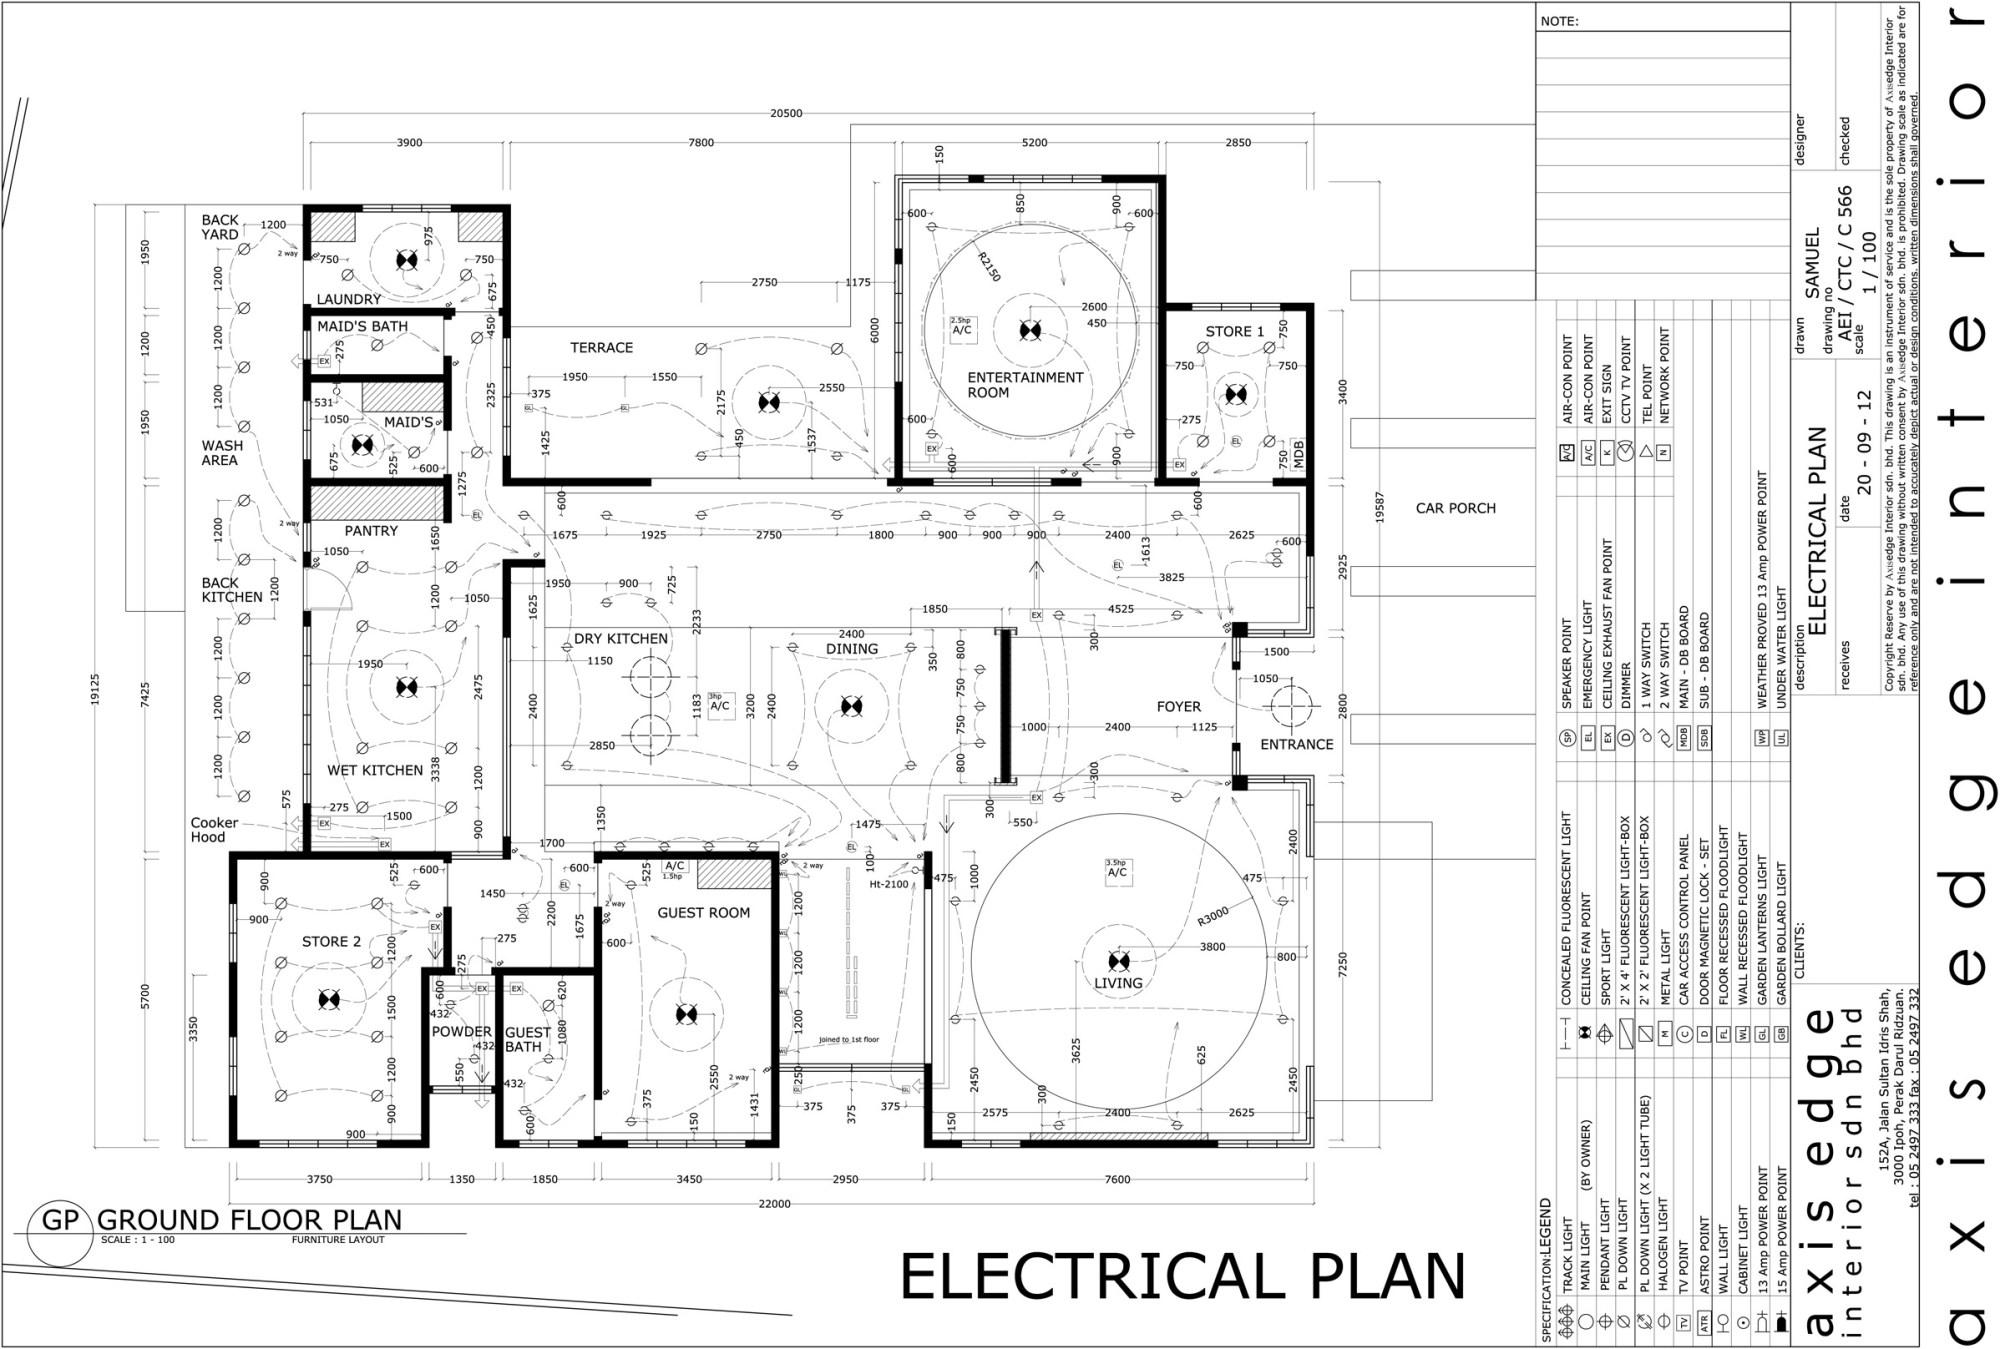 hight resolution of 3 phase electrical plan basic electronics wiring diagram univeral 3 phase symbol 3 phase electrical plan